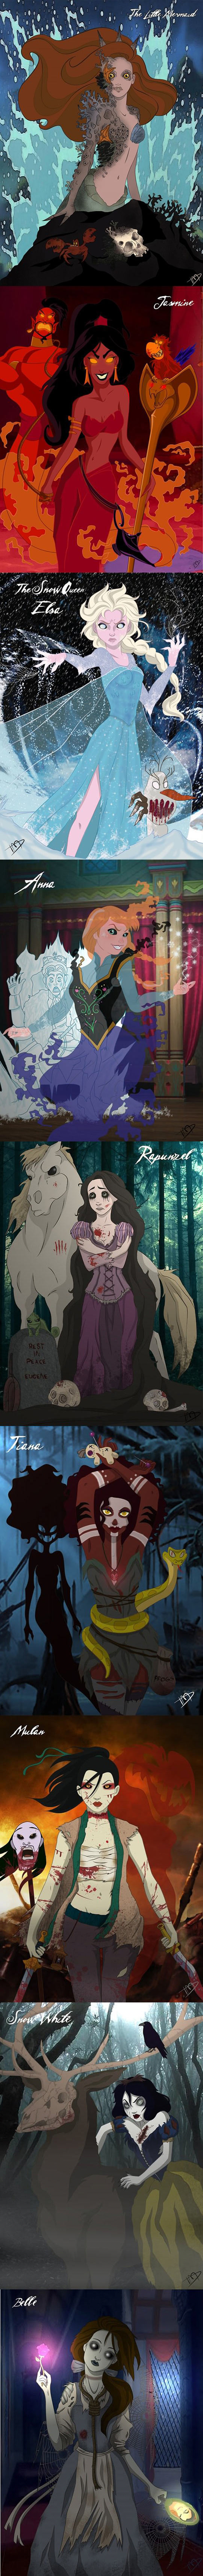 Creepy Zombie Disney Princesses